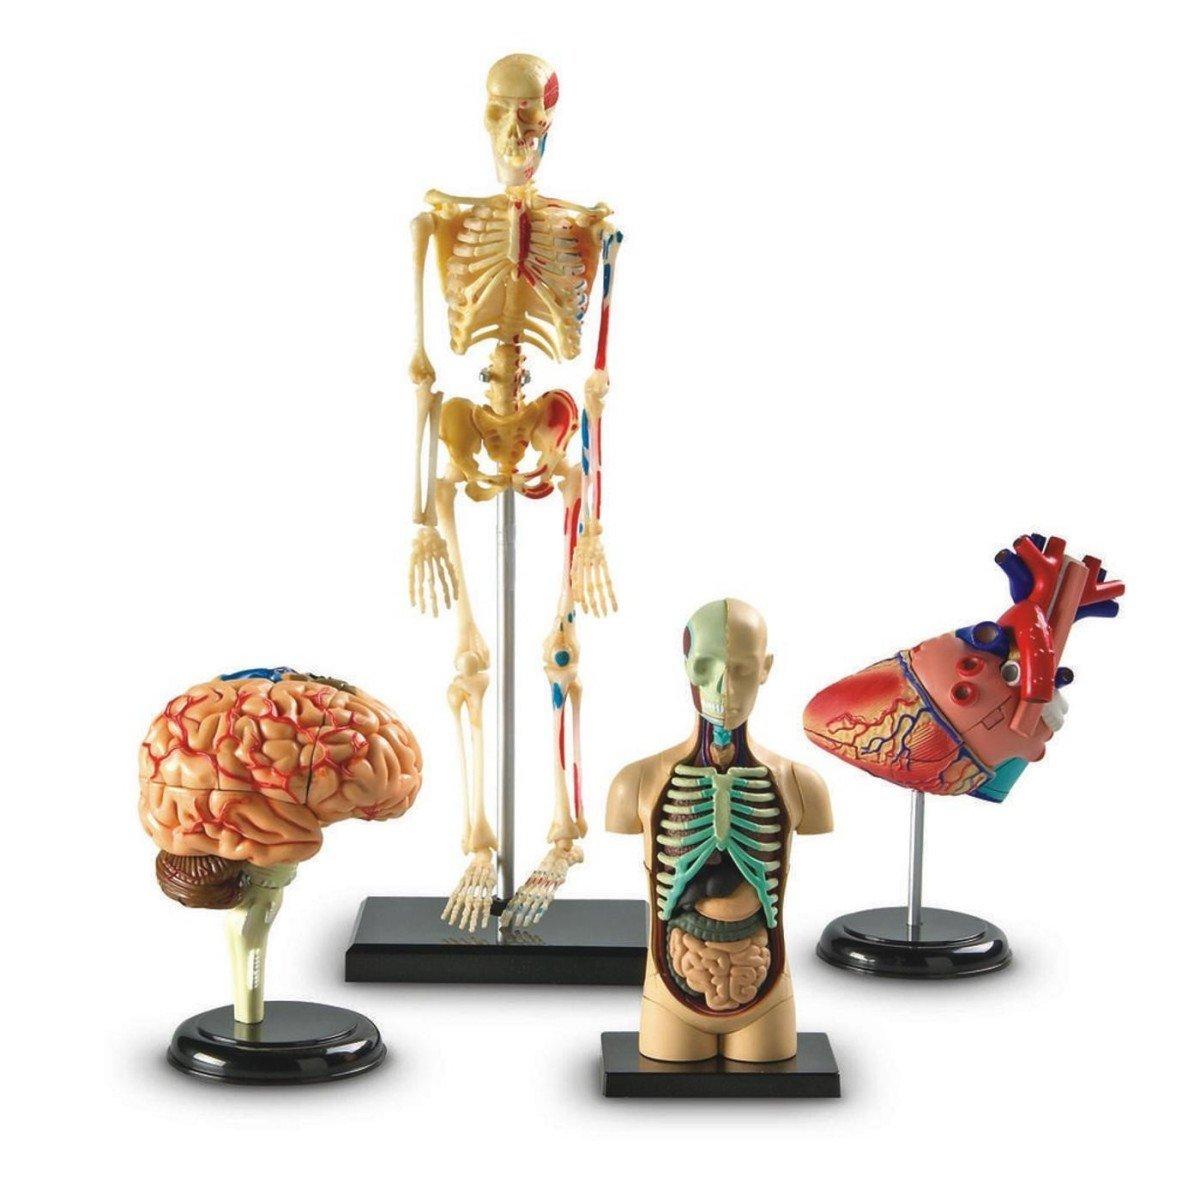 Amazon.com: Learning Resources Anatomy Models Bundle Set: Toys & Games